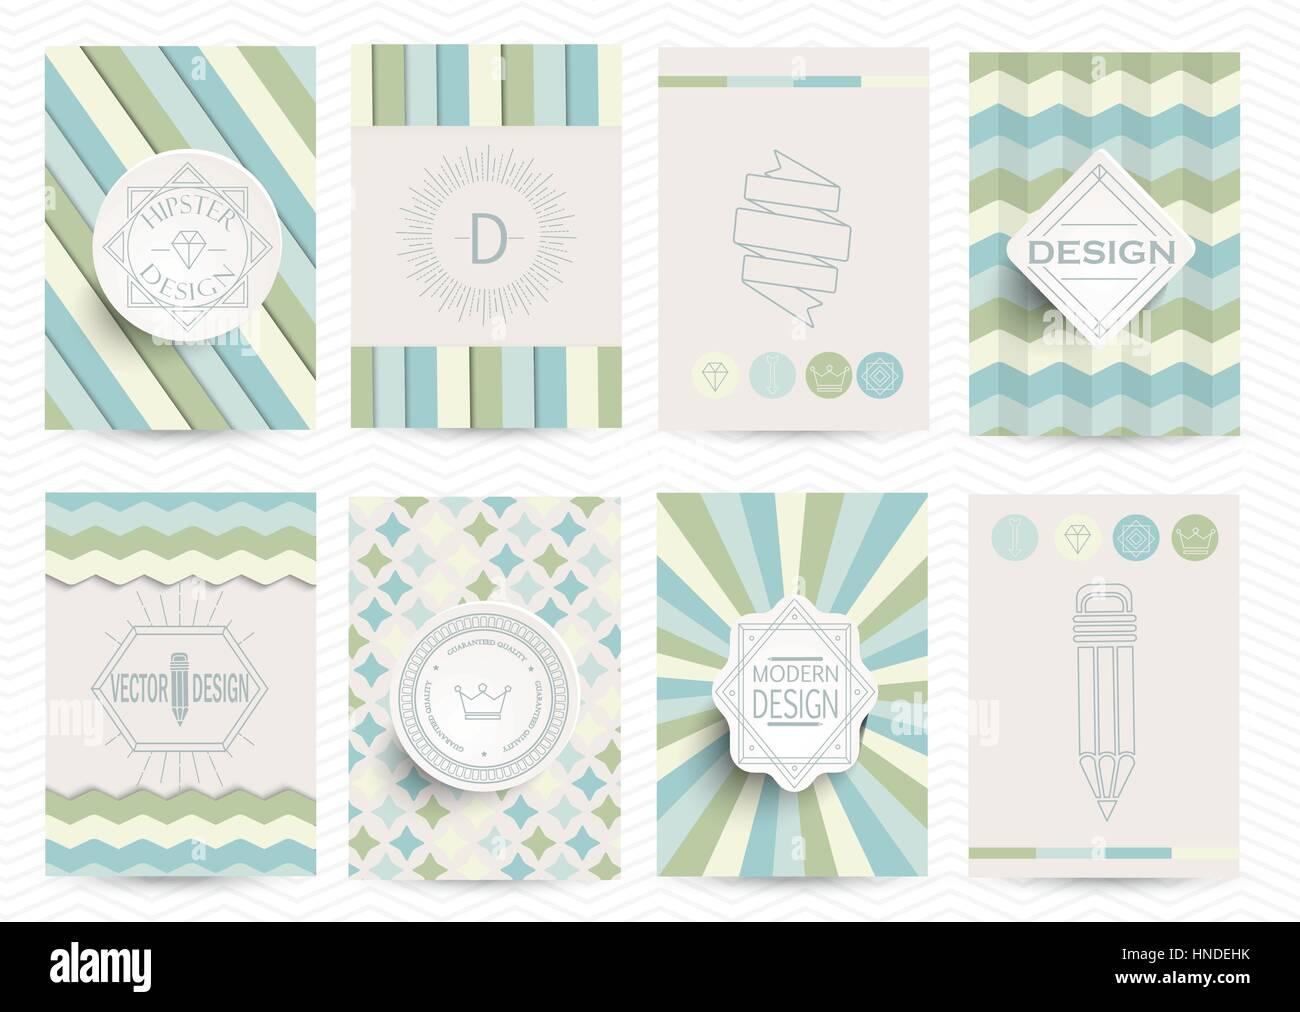 Set of Retro Insignias, Logotypes, brochures in vintage style. Vector design templates. - Stock Vector